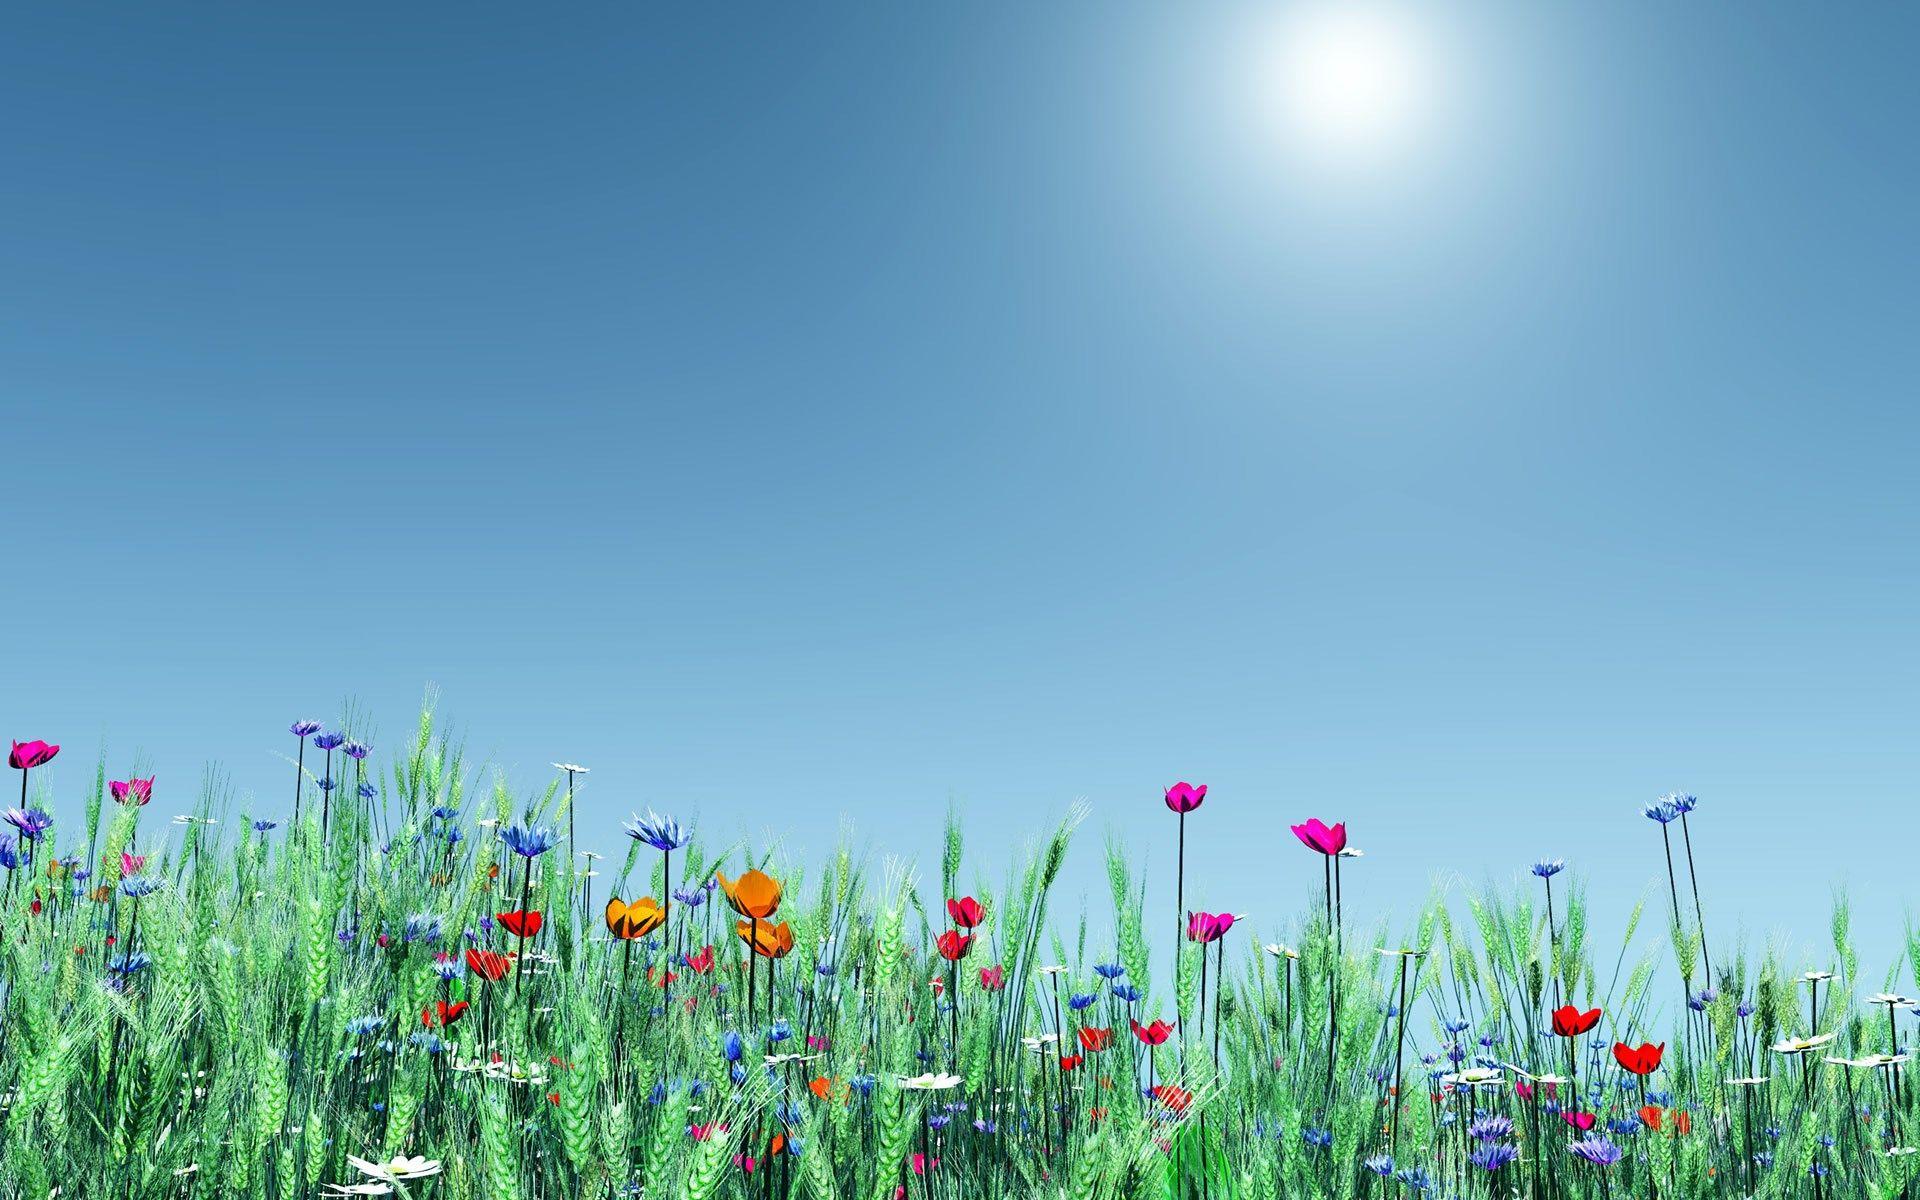 spring flowers background widescreen o oshka